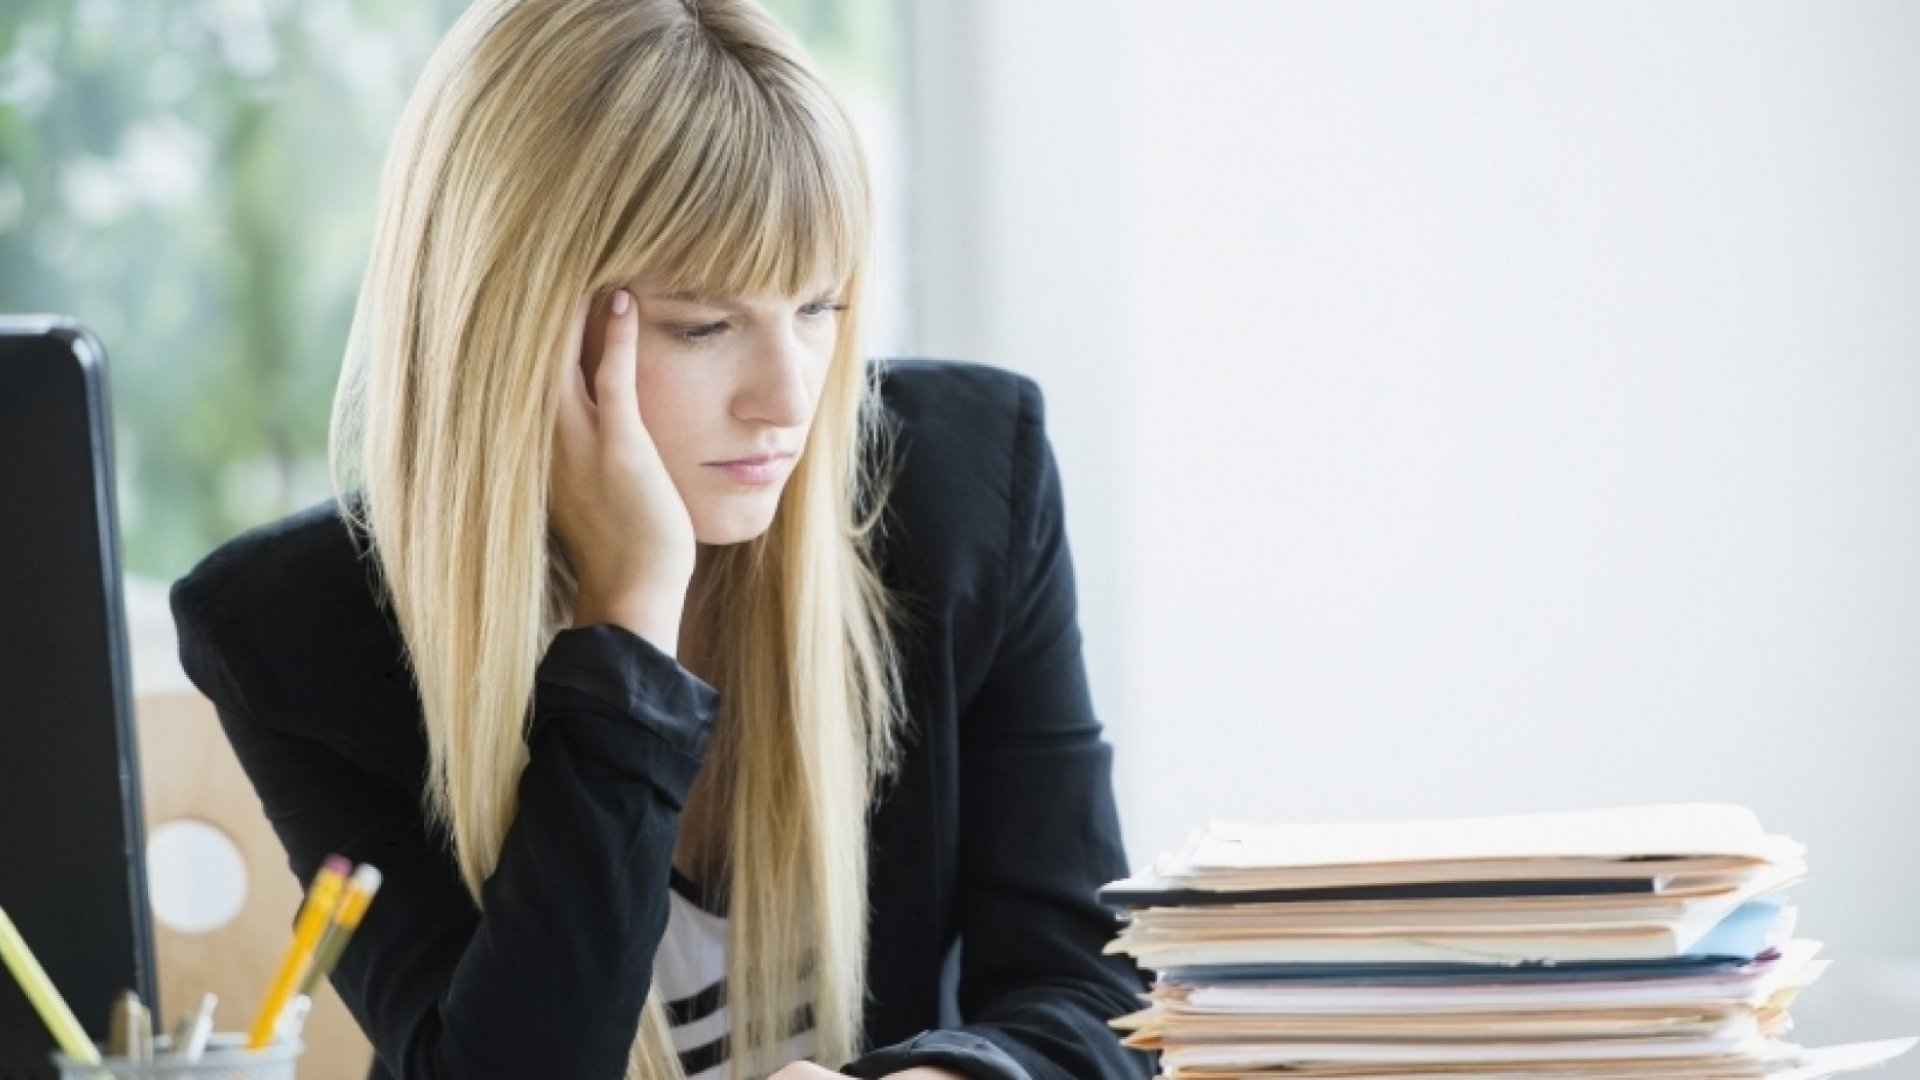 10 Ways to Reduce Stress in Under 10 Minutes